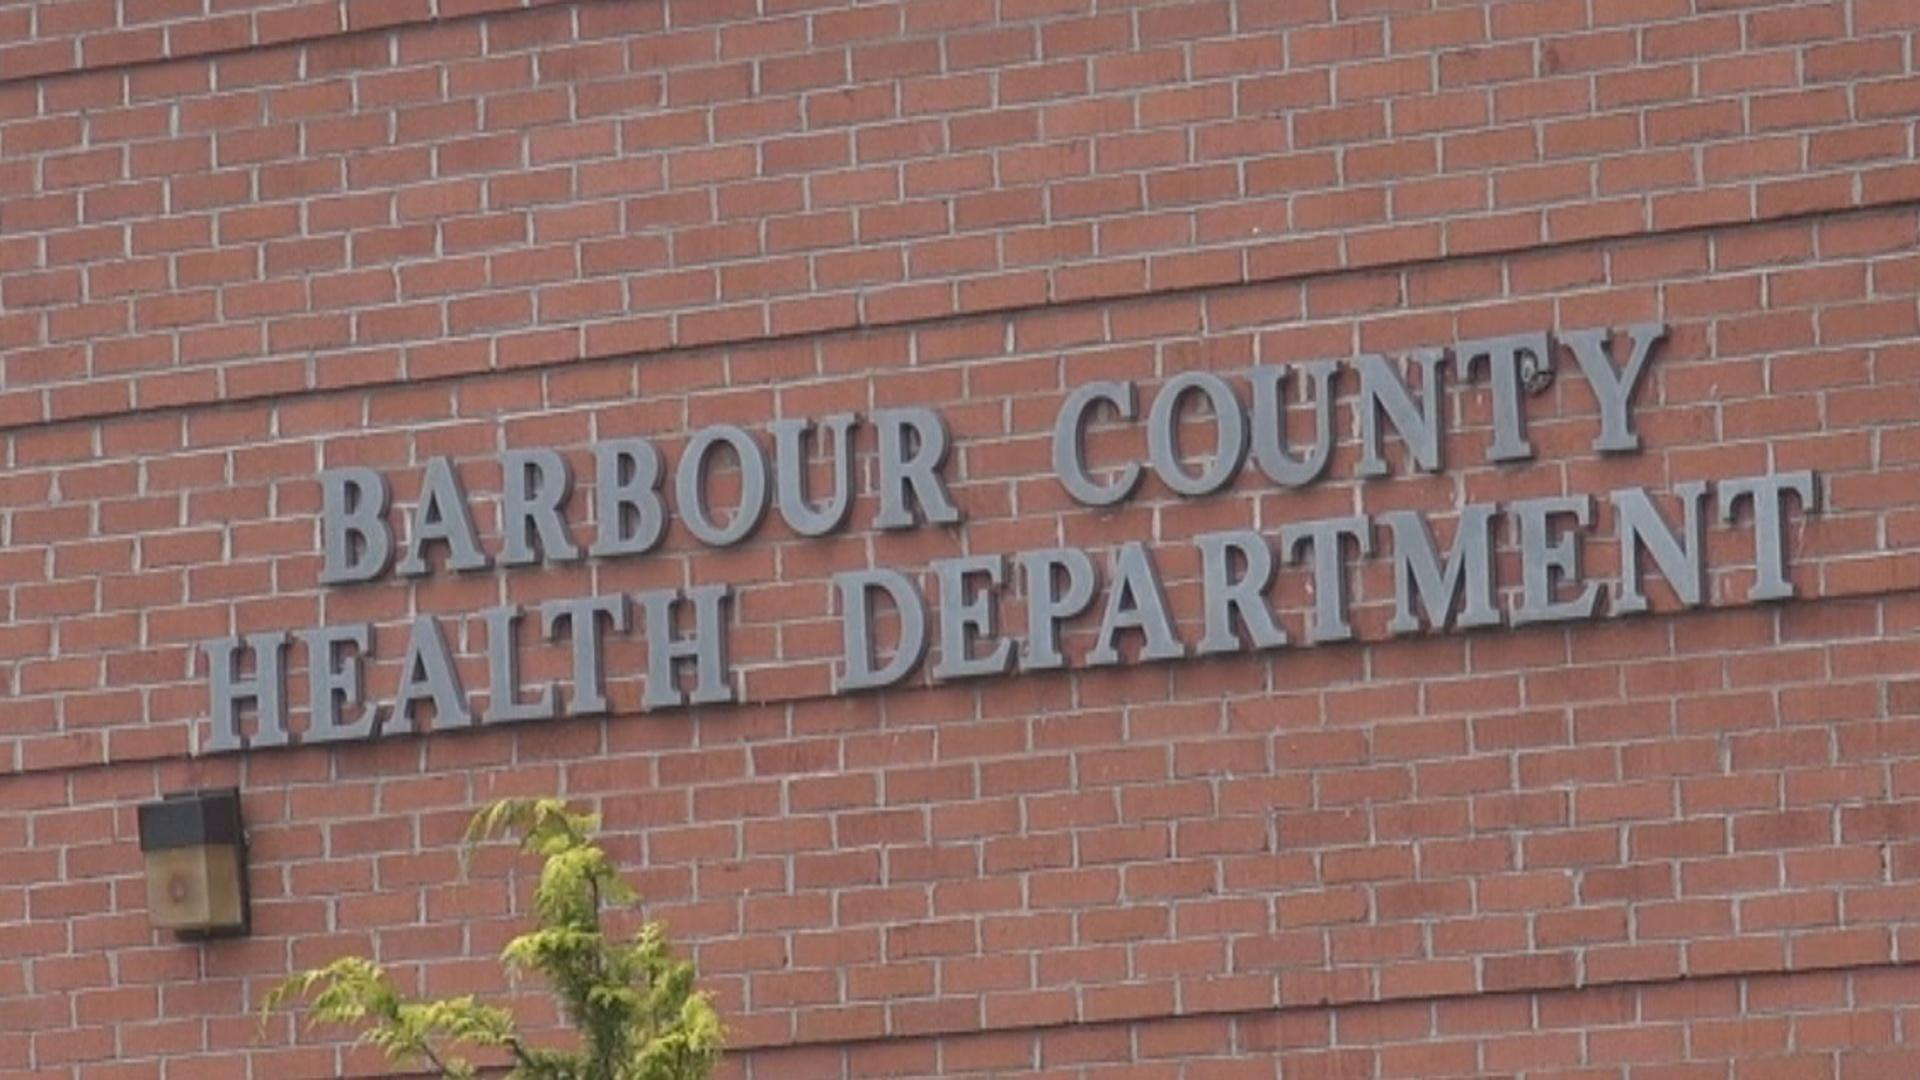 Barbour County Health Department.jpg